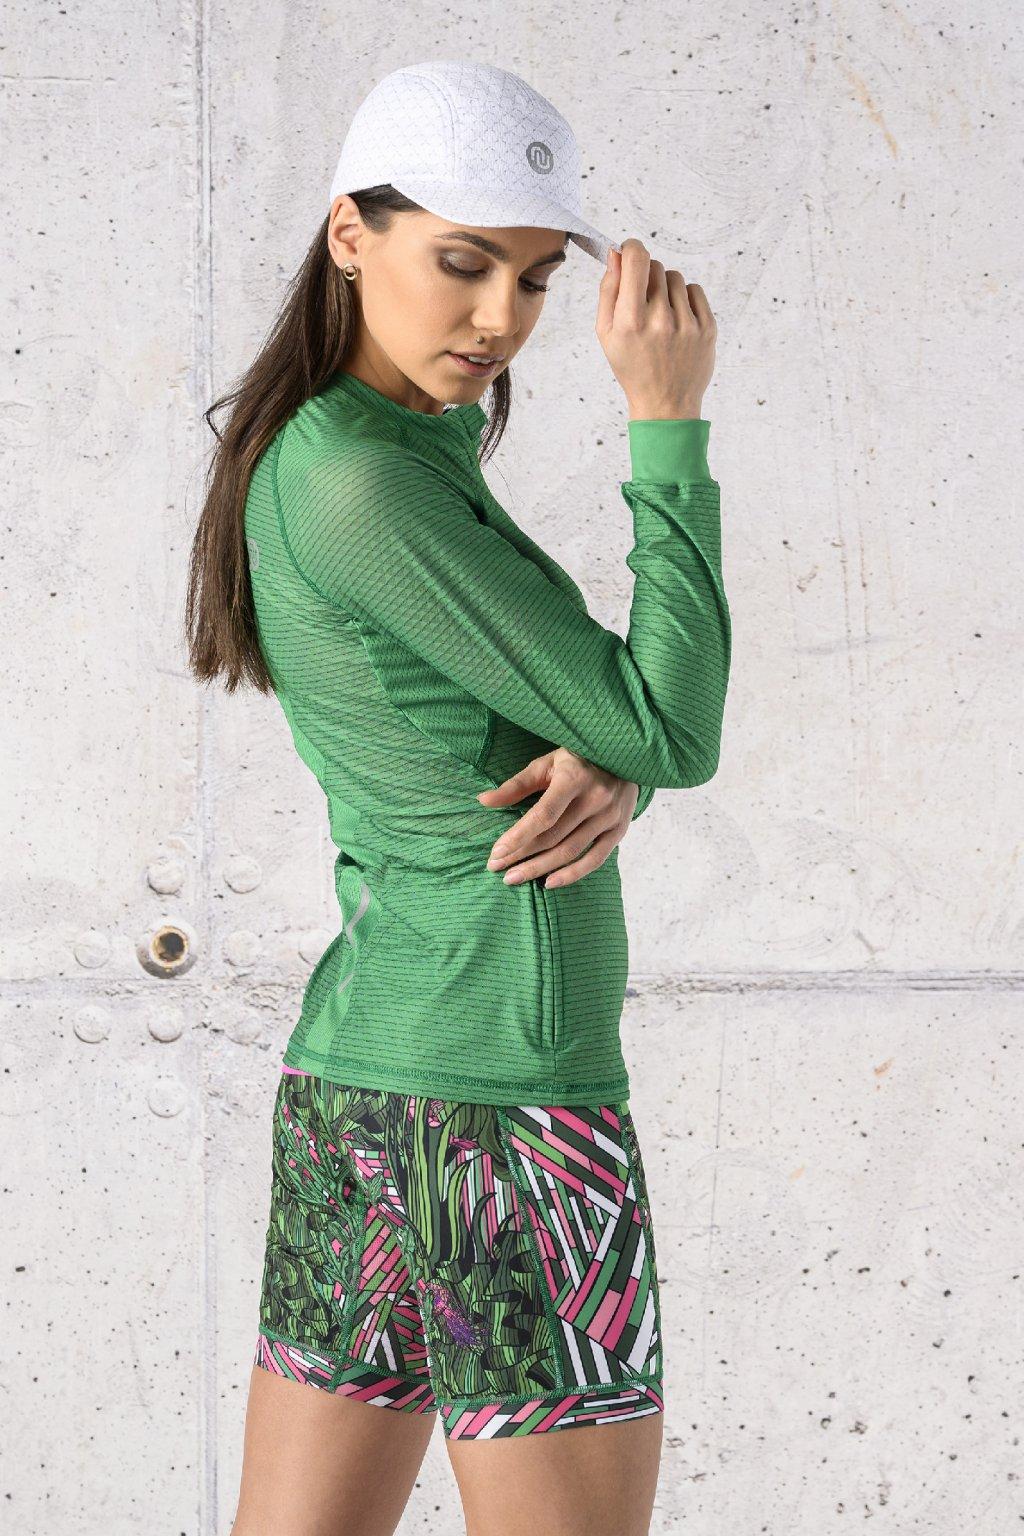 Běžecké tričko s dlouhým rukávem carbon KLC 07 1